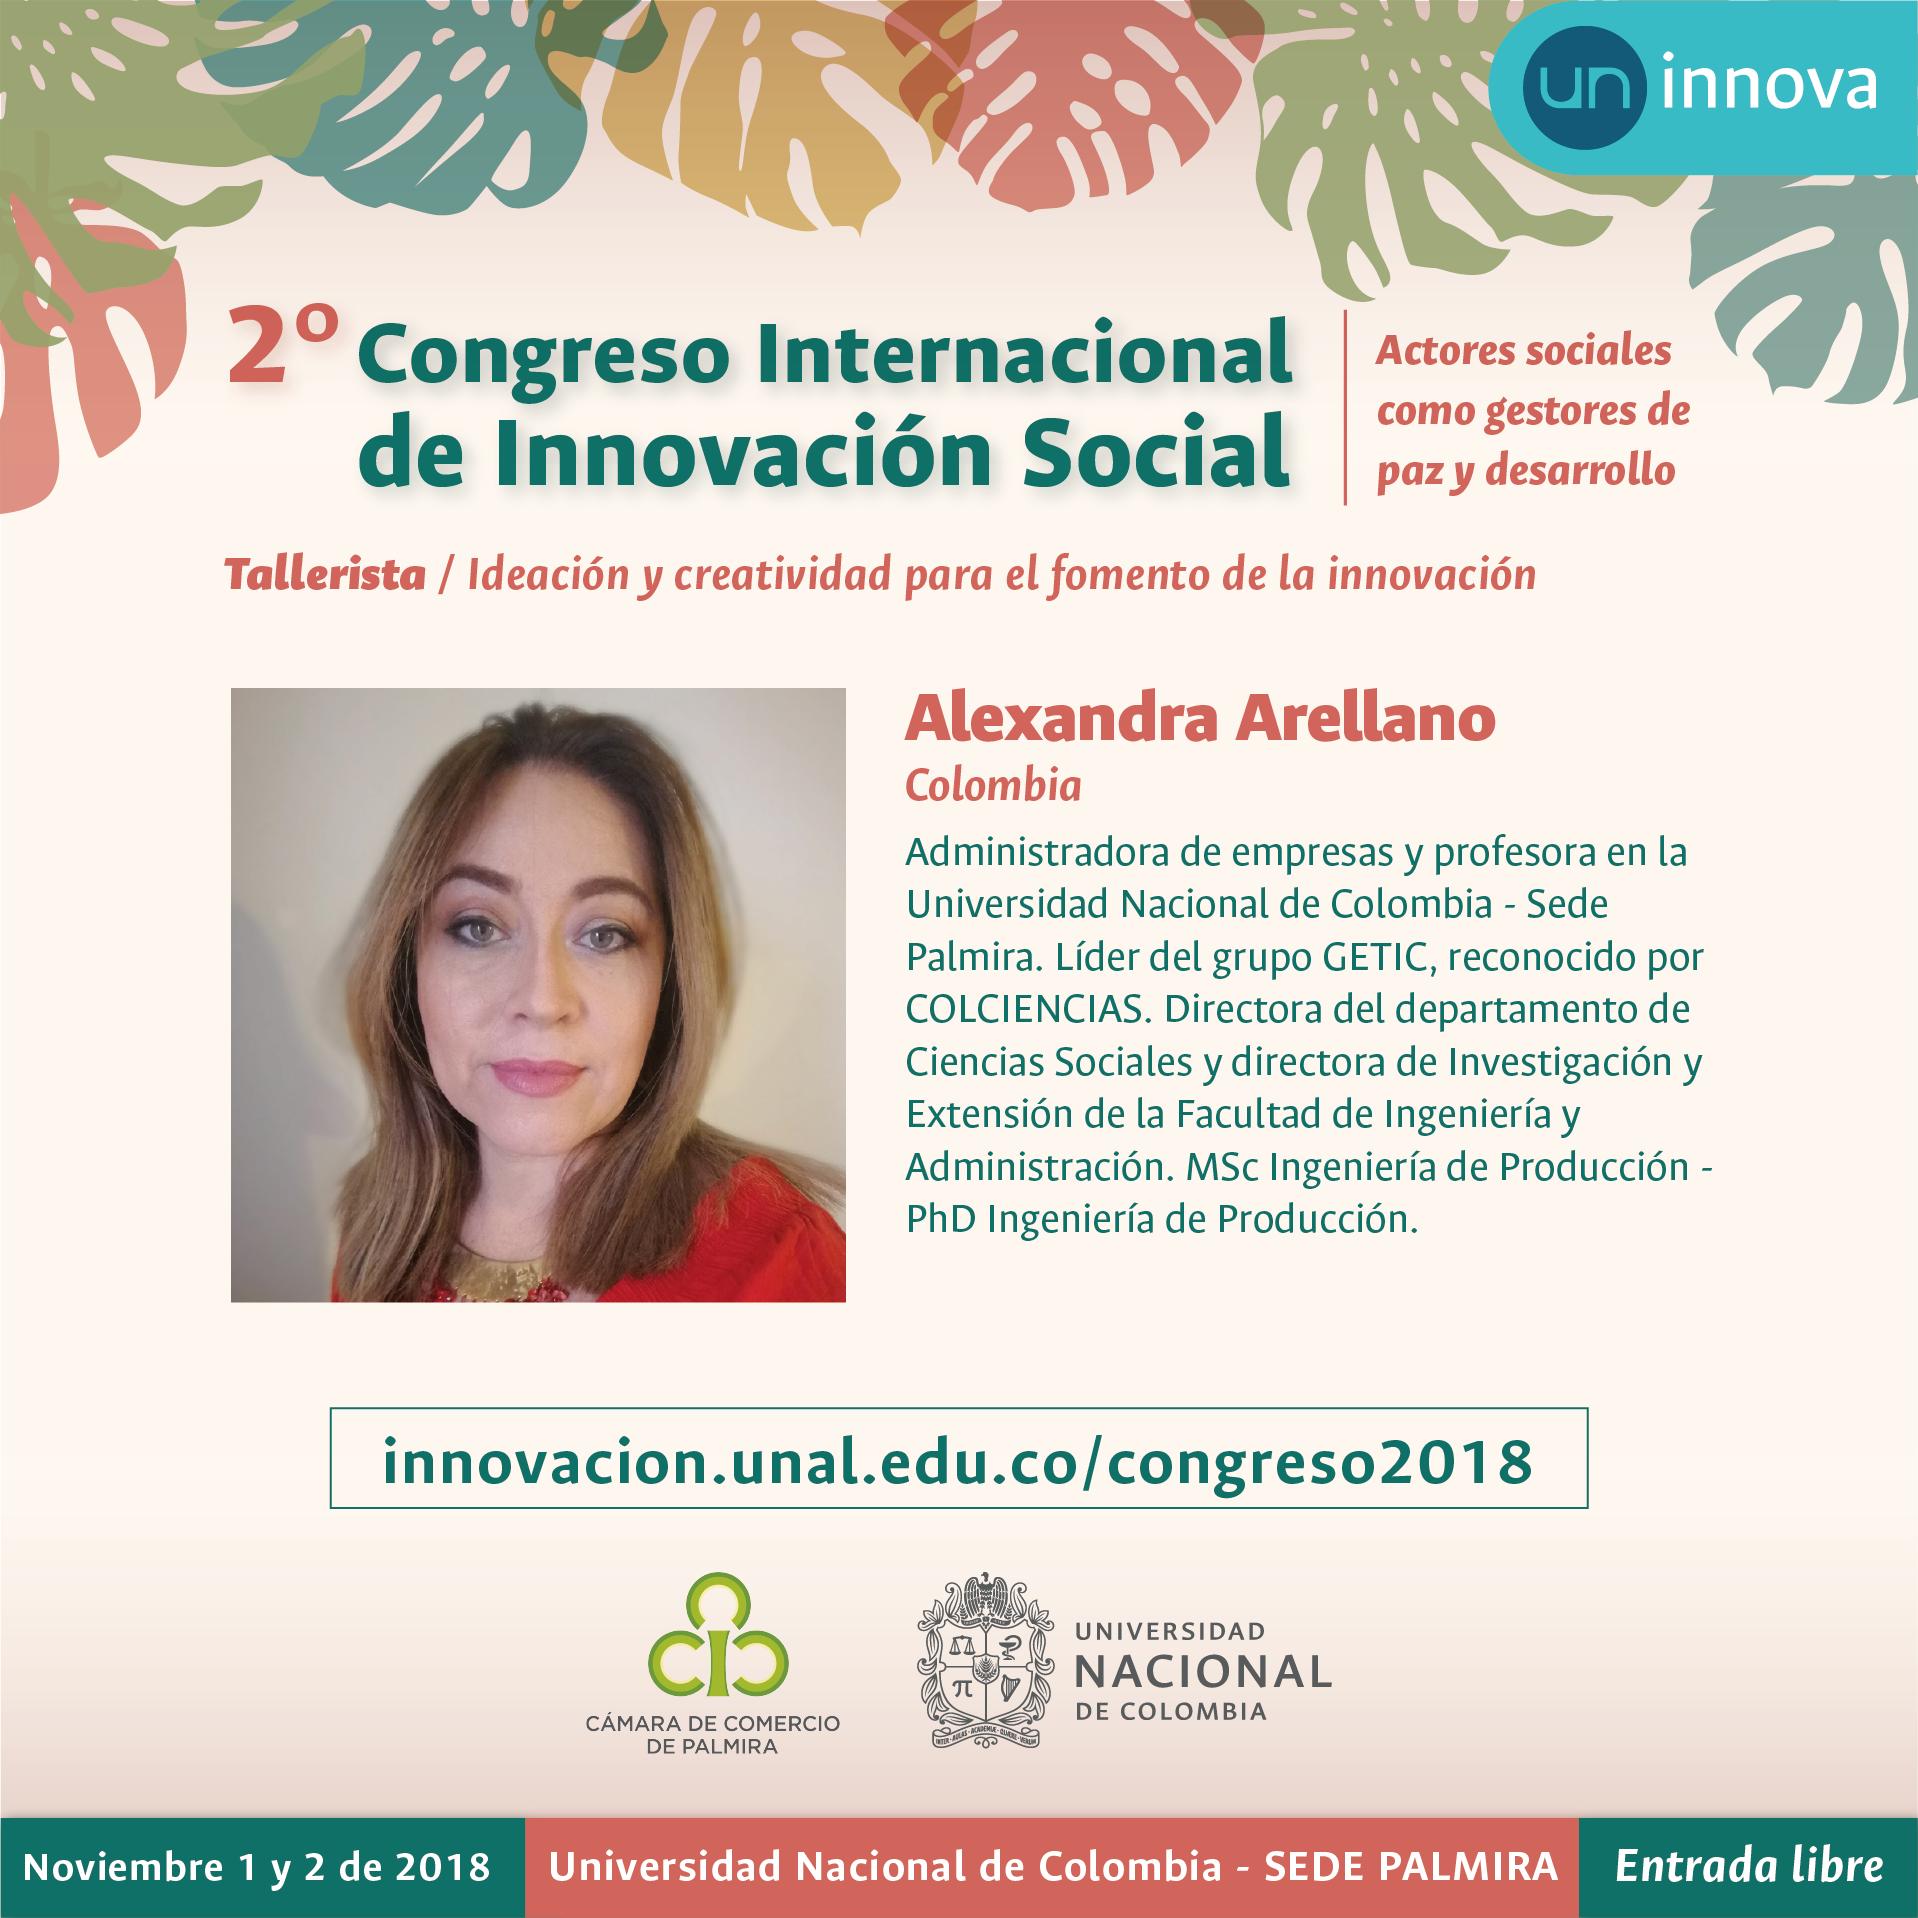 Alexandra Arellano